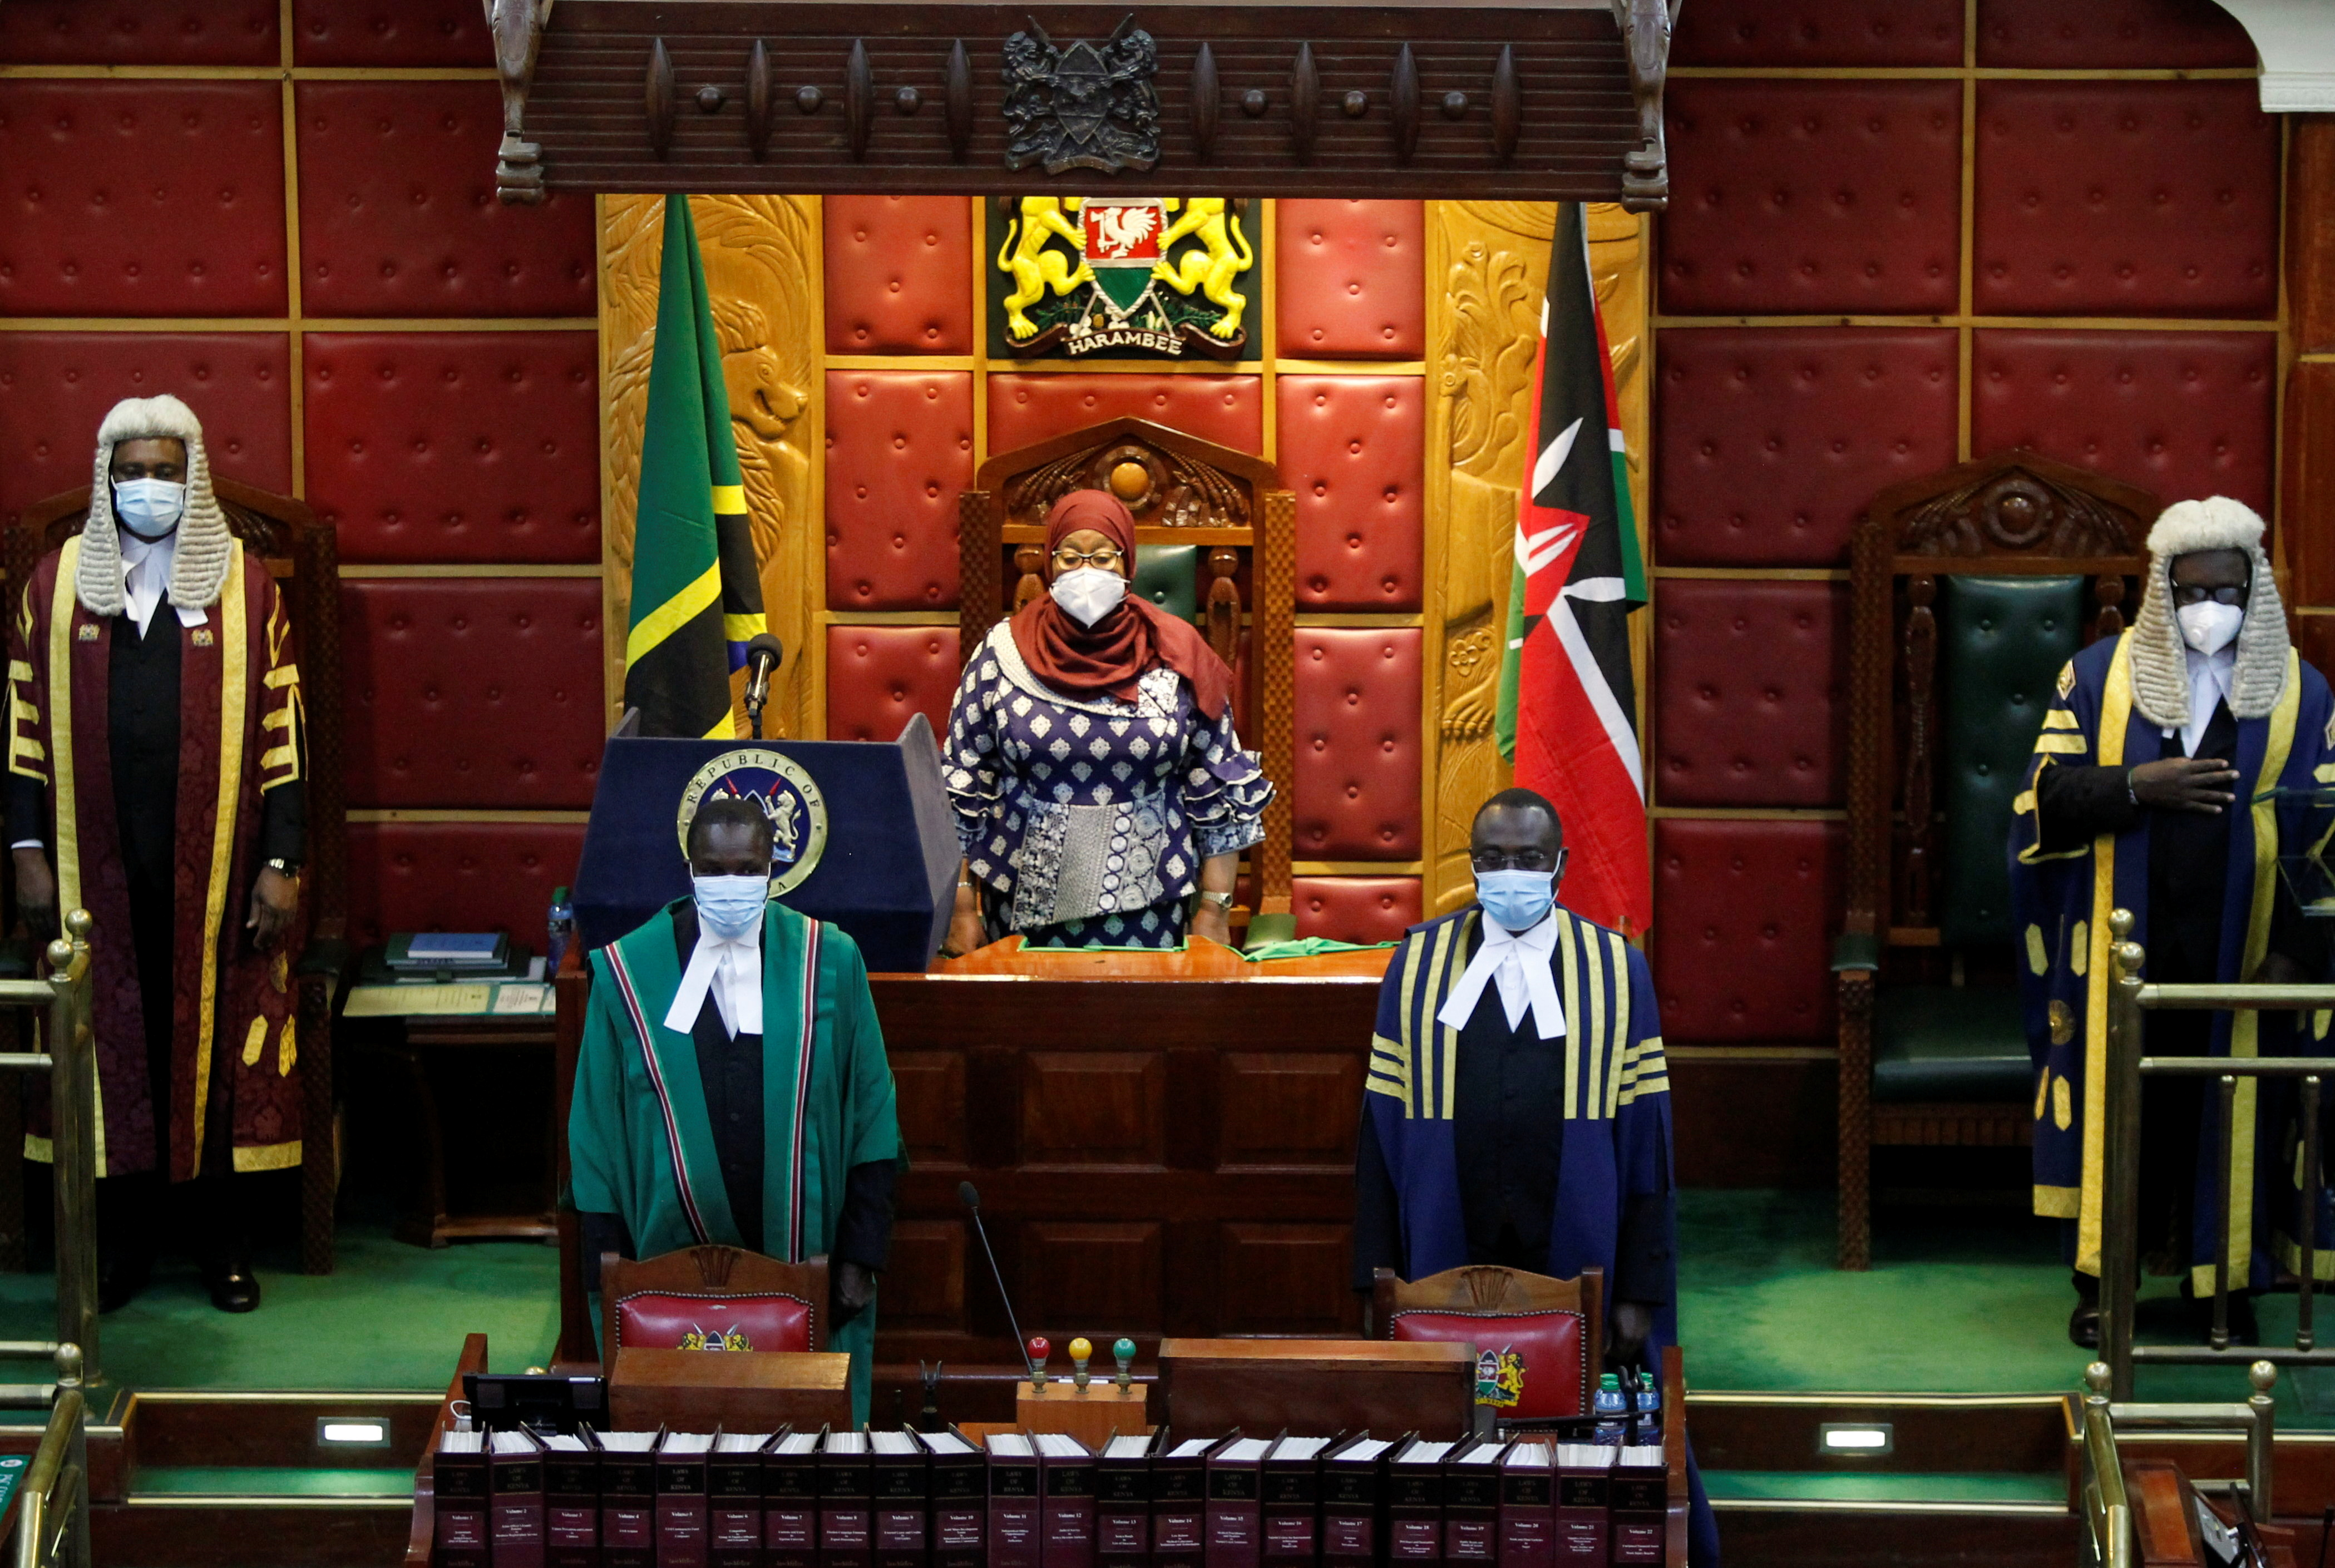 Tanzanian President Samia Suluhu Hassan (C) arrives to address a joint Parliament session of Kenyan Members of Parliament and Senators in Nairobi, Kenya, May 5, 2021. REUTERS/Monicah Mwangi